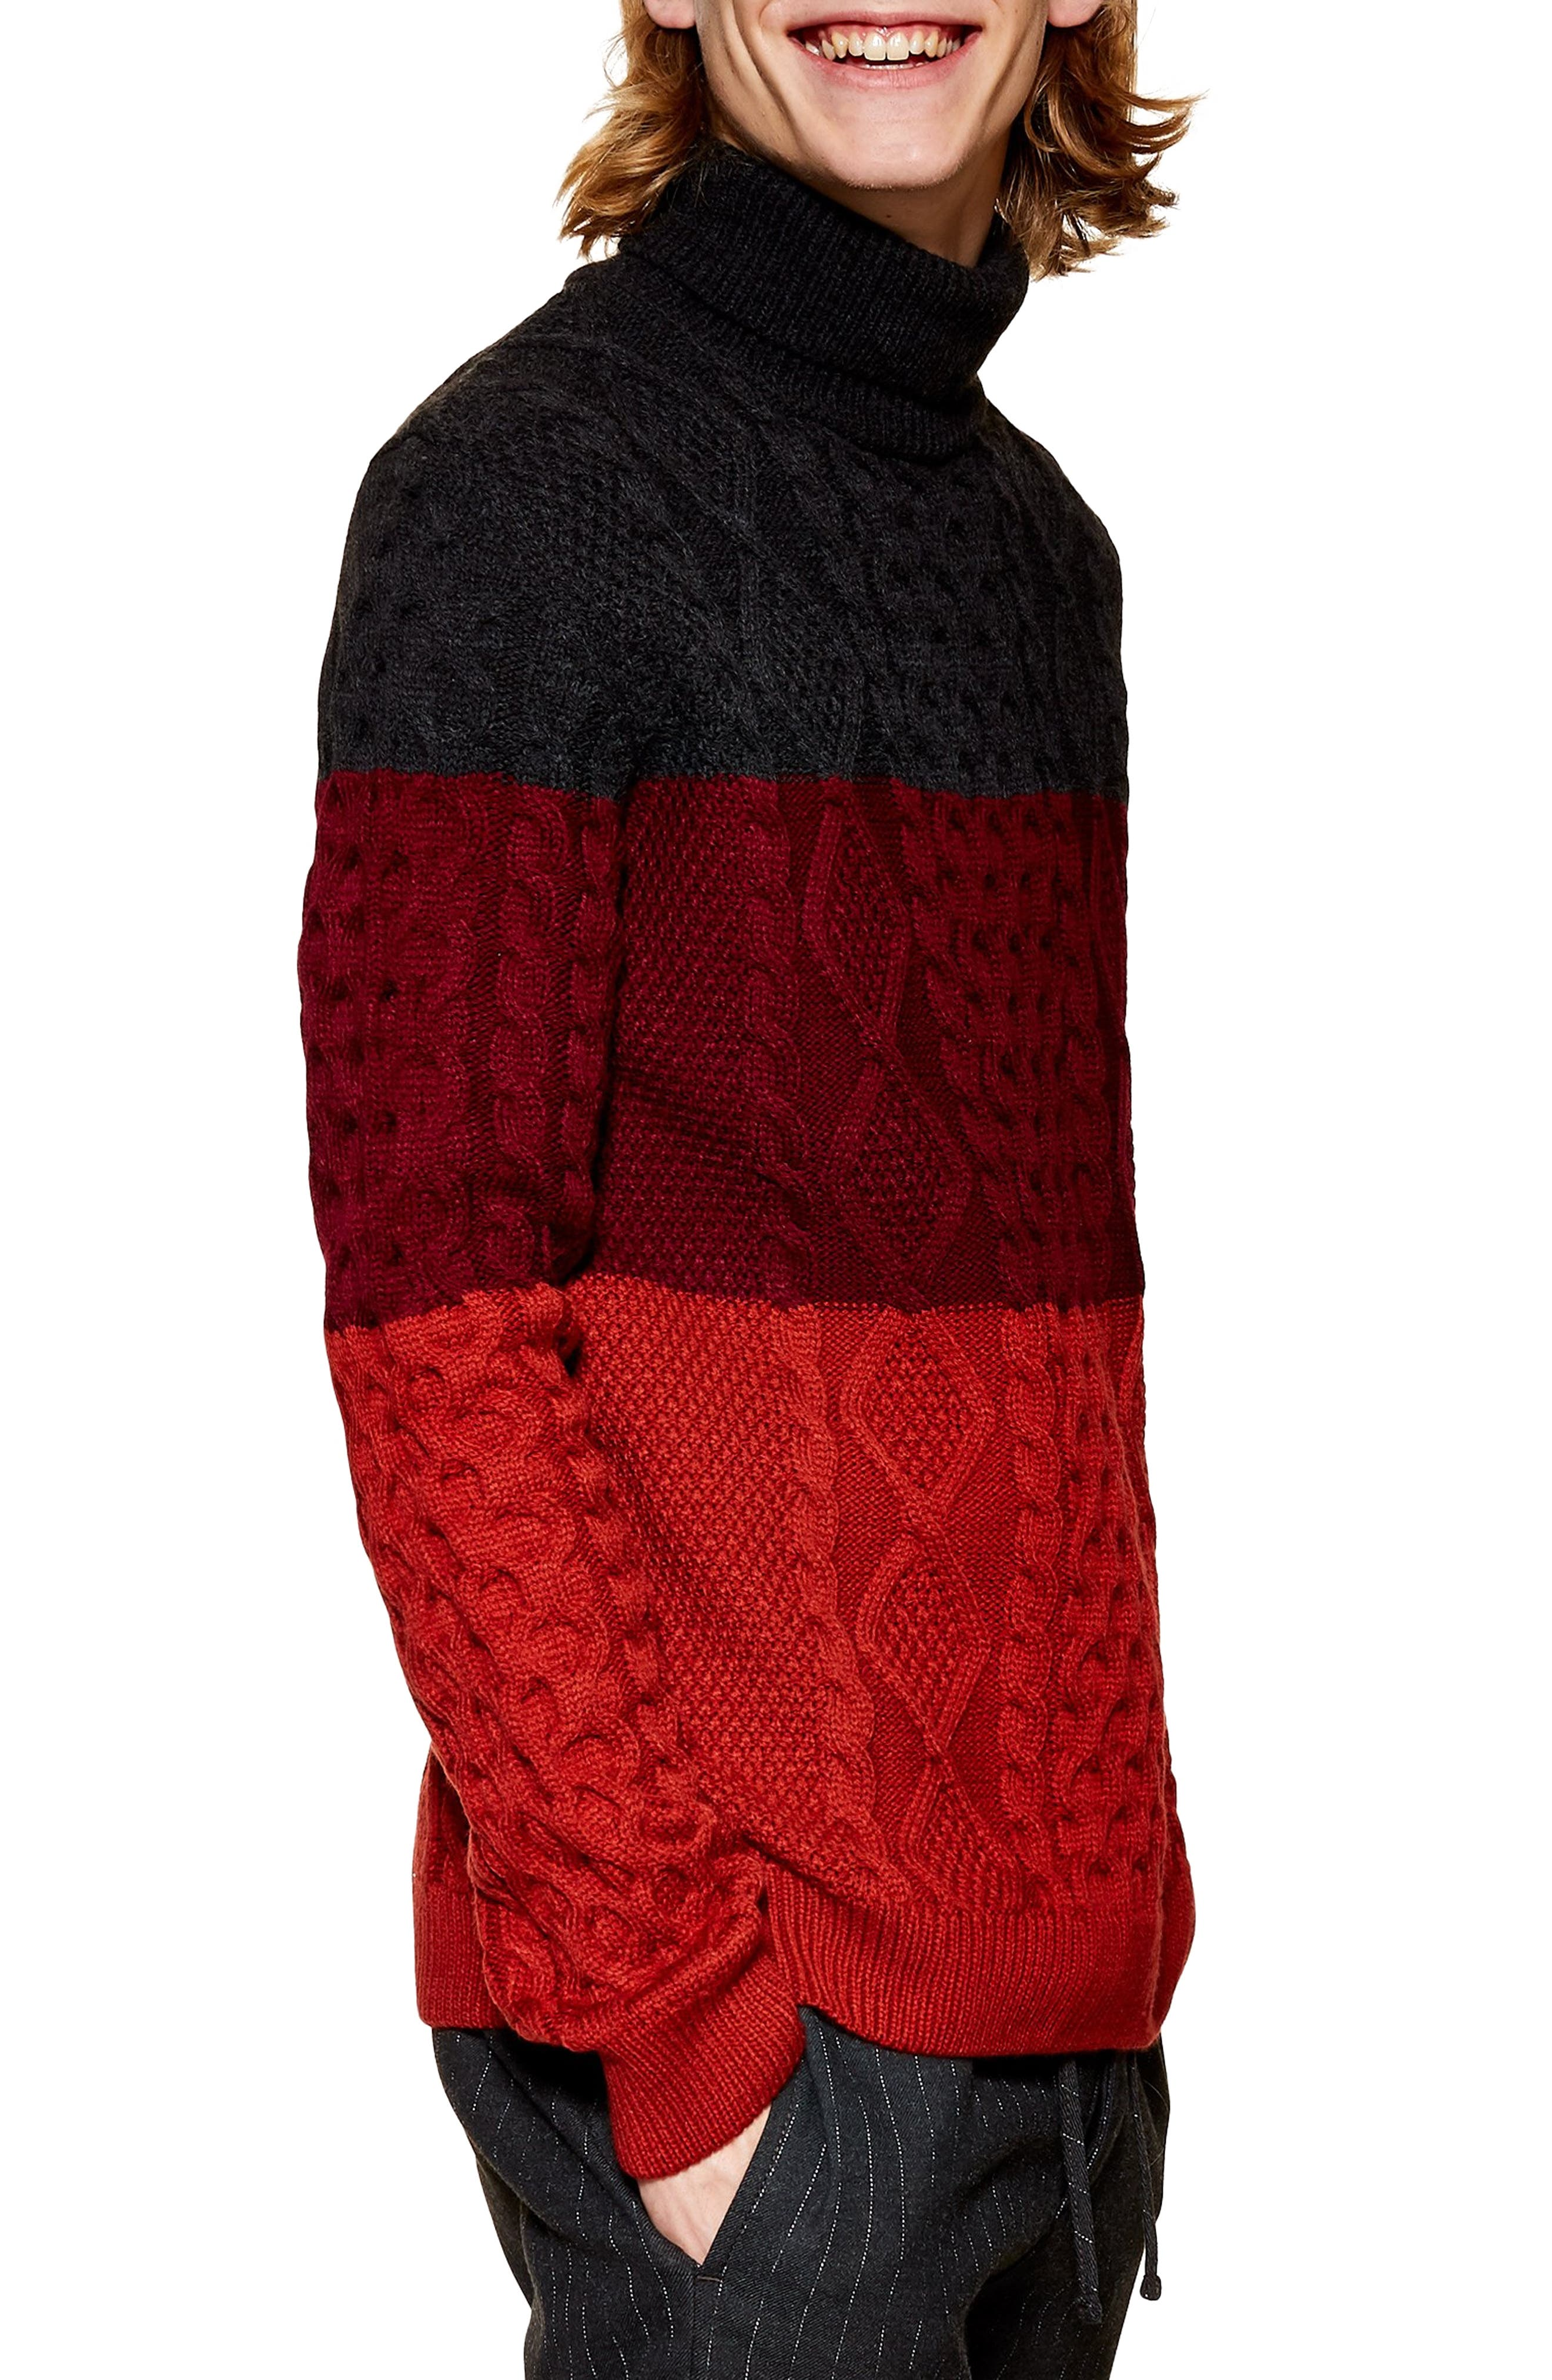 Topman Colorblock Cable Knit Turtleneck Sweater